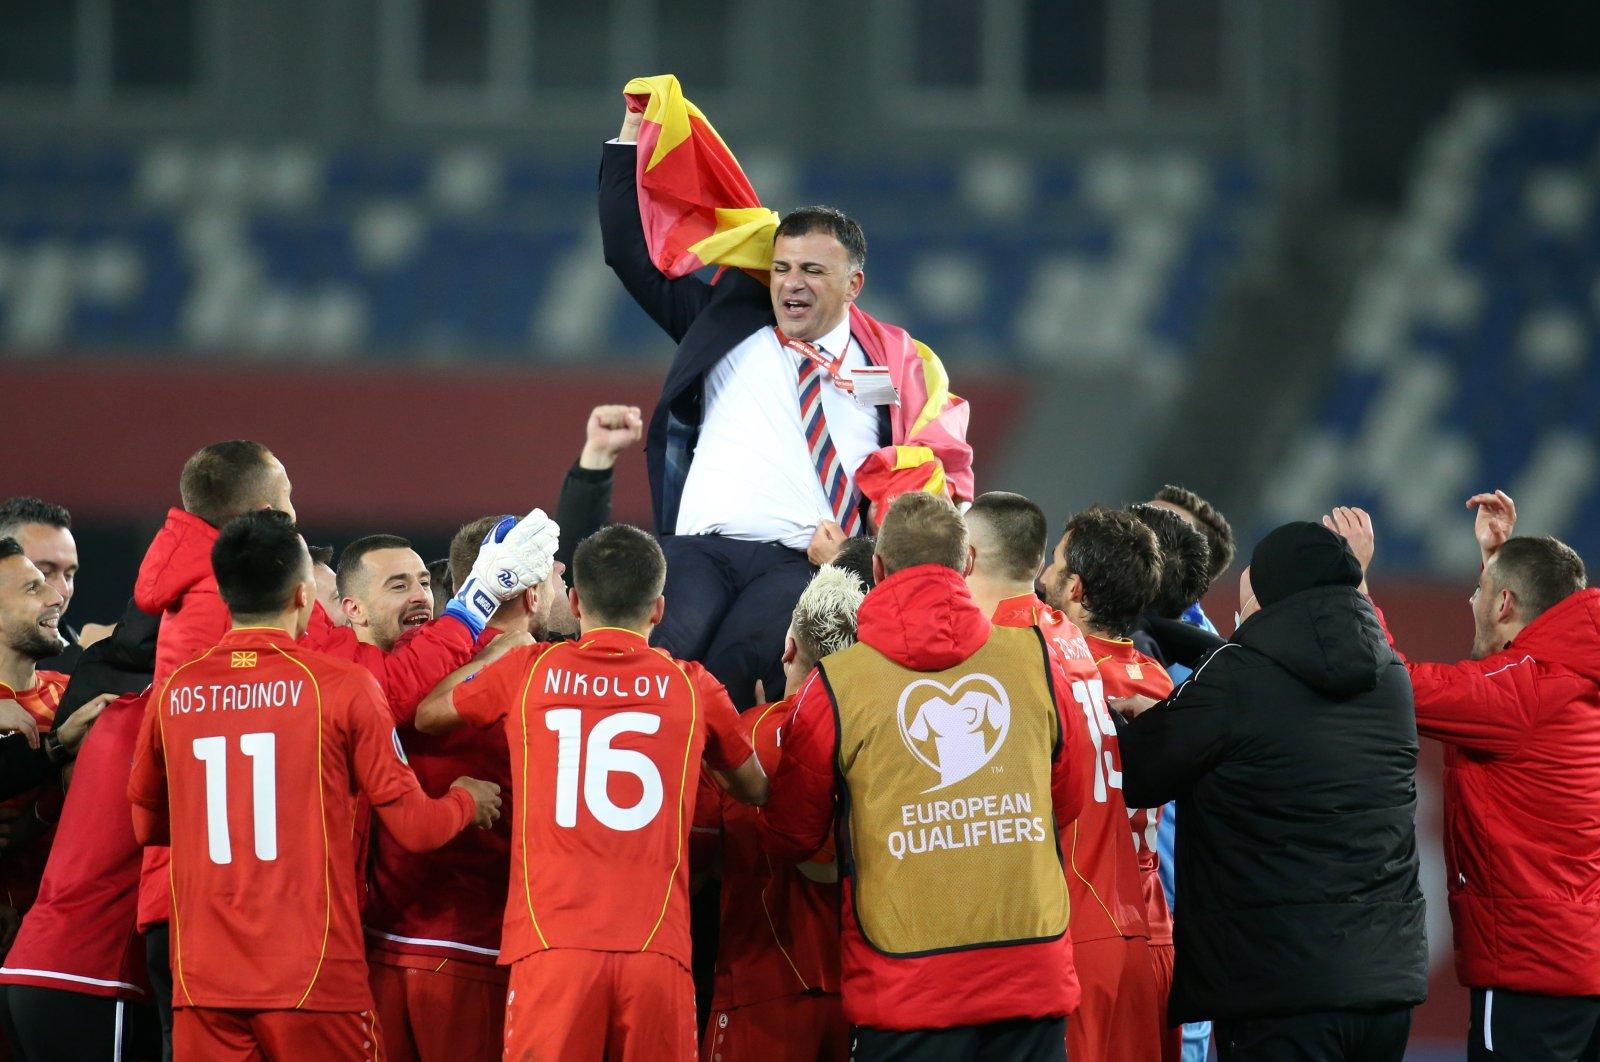 North Macedonia coach Igor Angelovski celebrates with players after the Euro 2020 Playoff Final match against Georgia at Boris Paichadze Dinamo Arena, Tbilisi, Georgia, Nov. 12, 2020. (Reuters Photo)